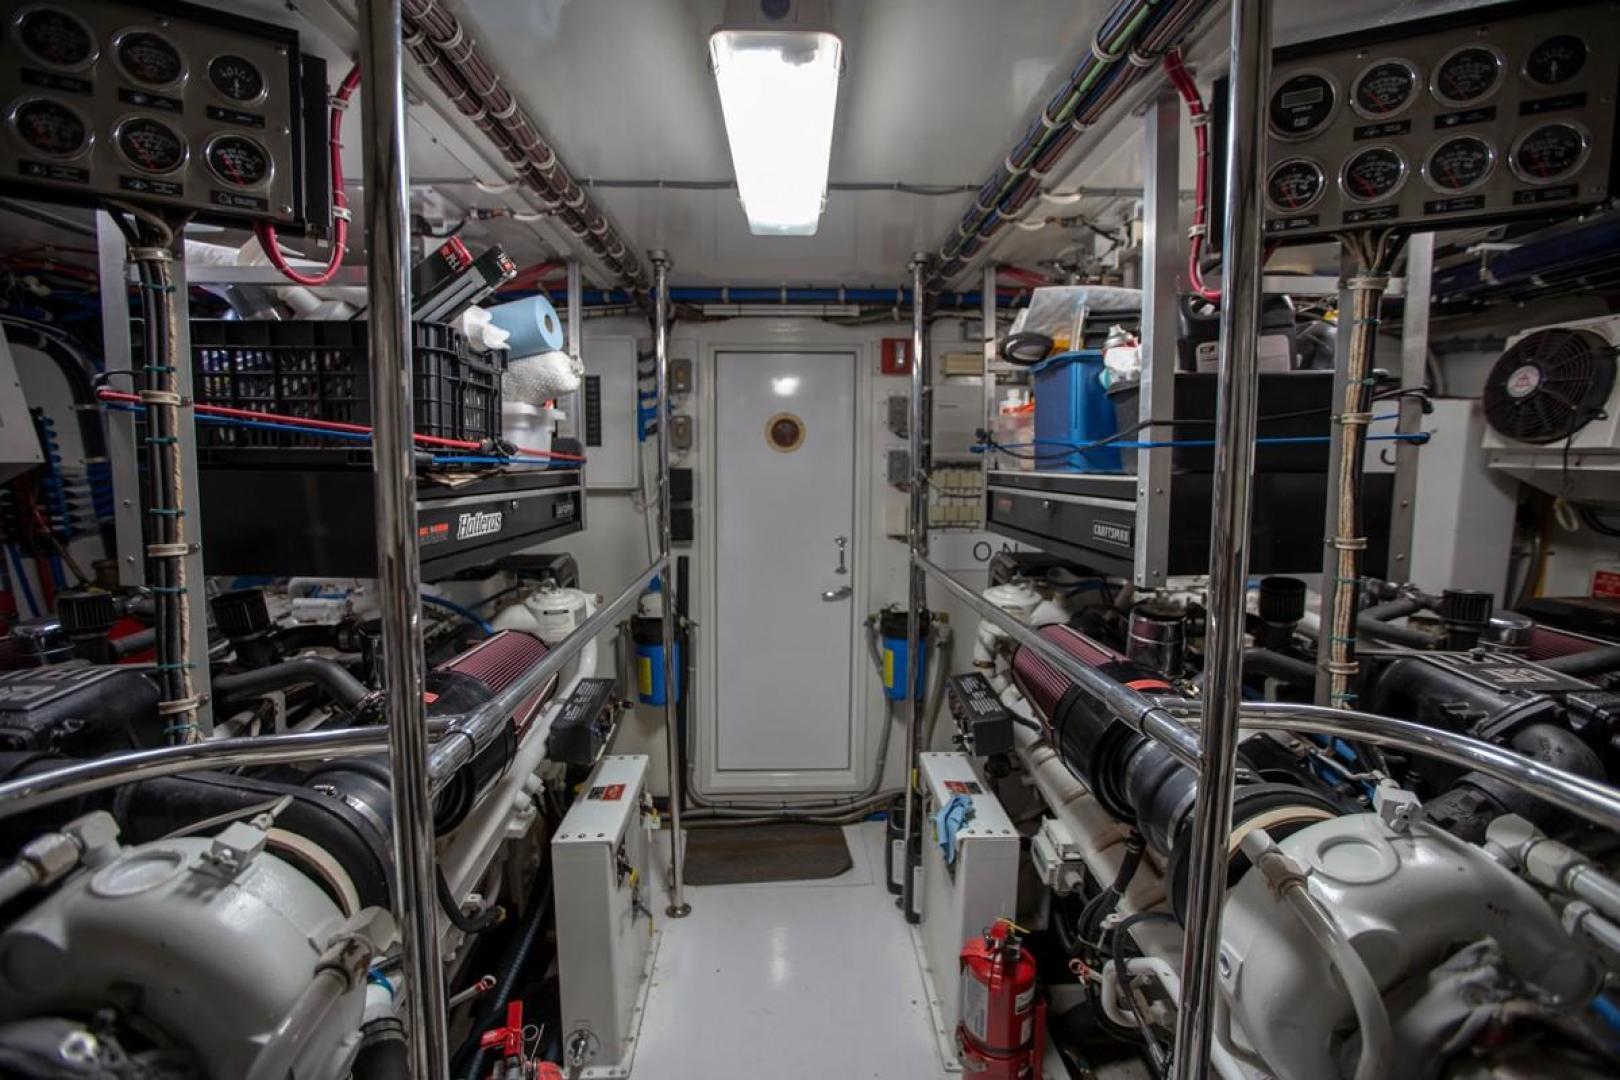 Hatteras-Cockpit Motor Yacht 2000-Getaway Ft. Lauderdale-Florida-United States-977383 | Thumbnail